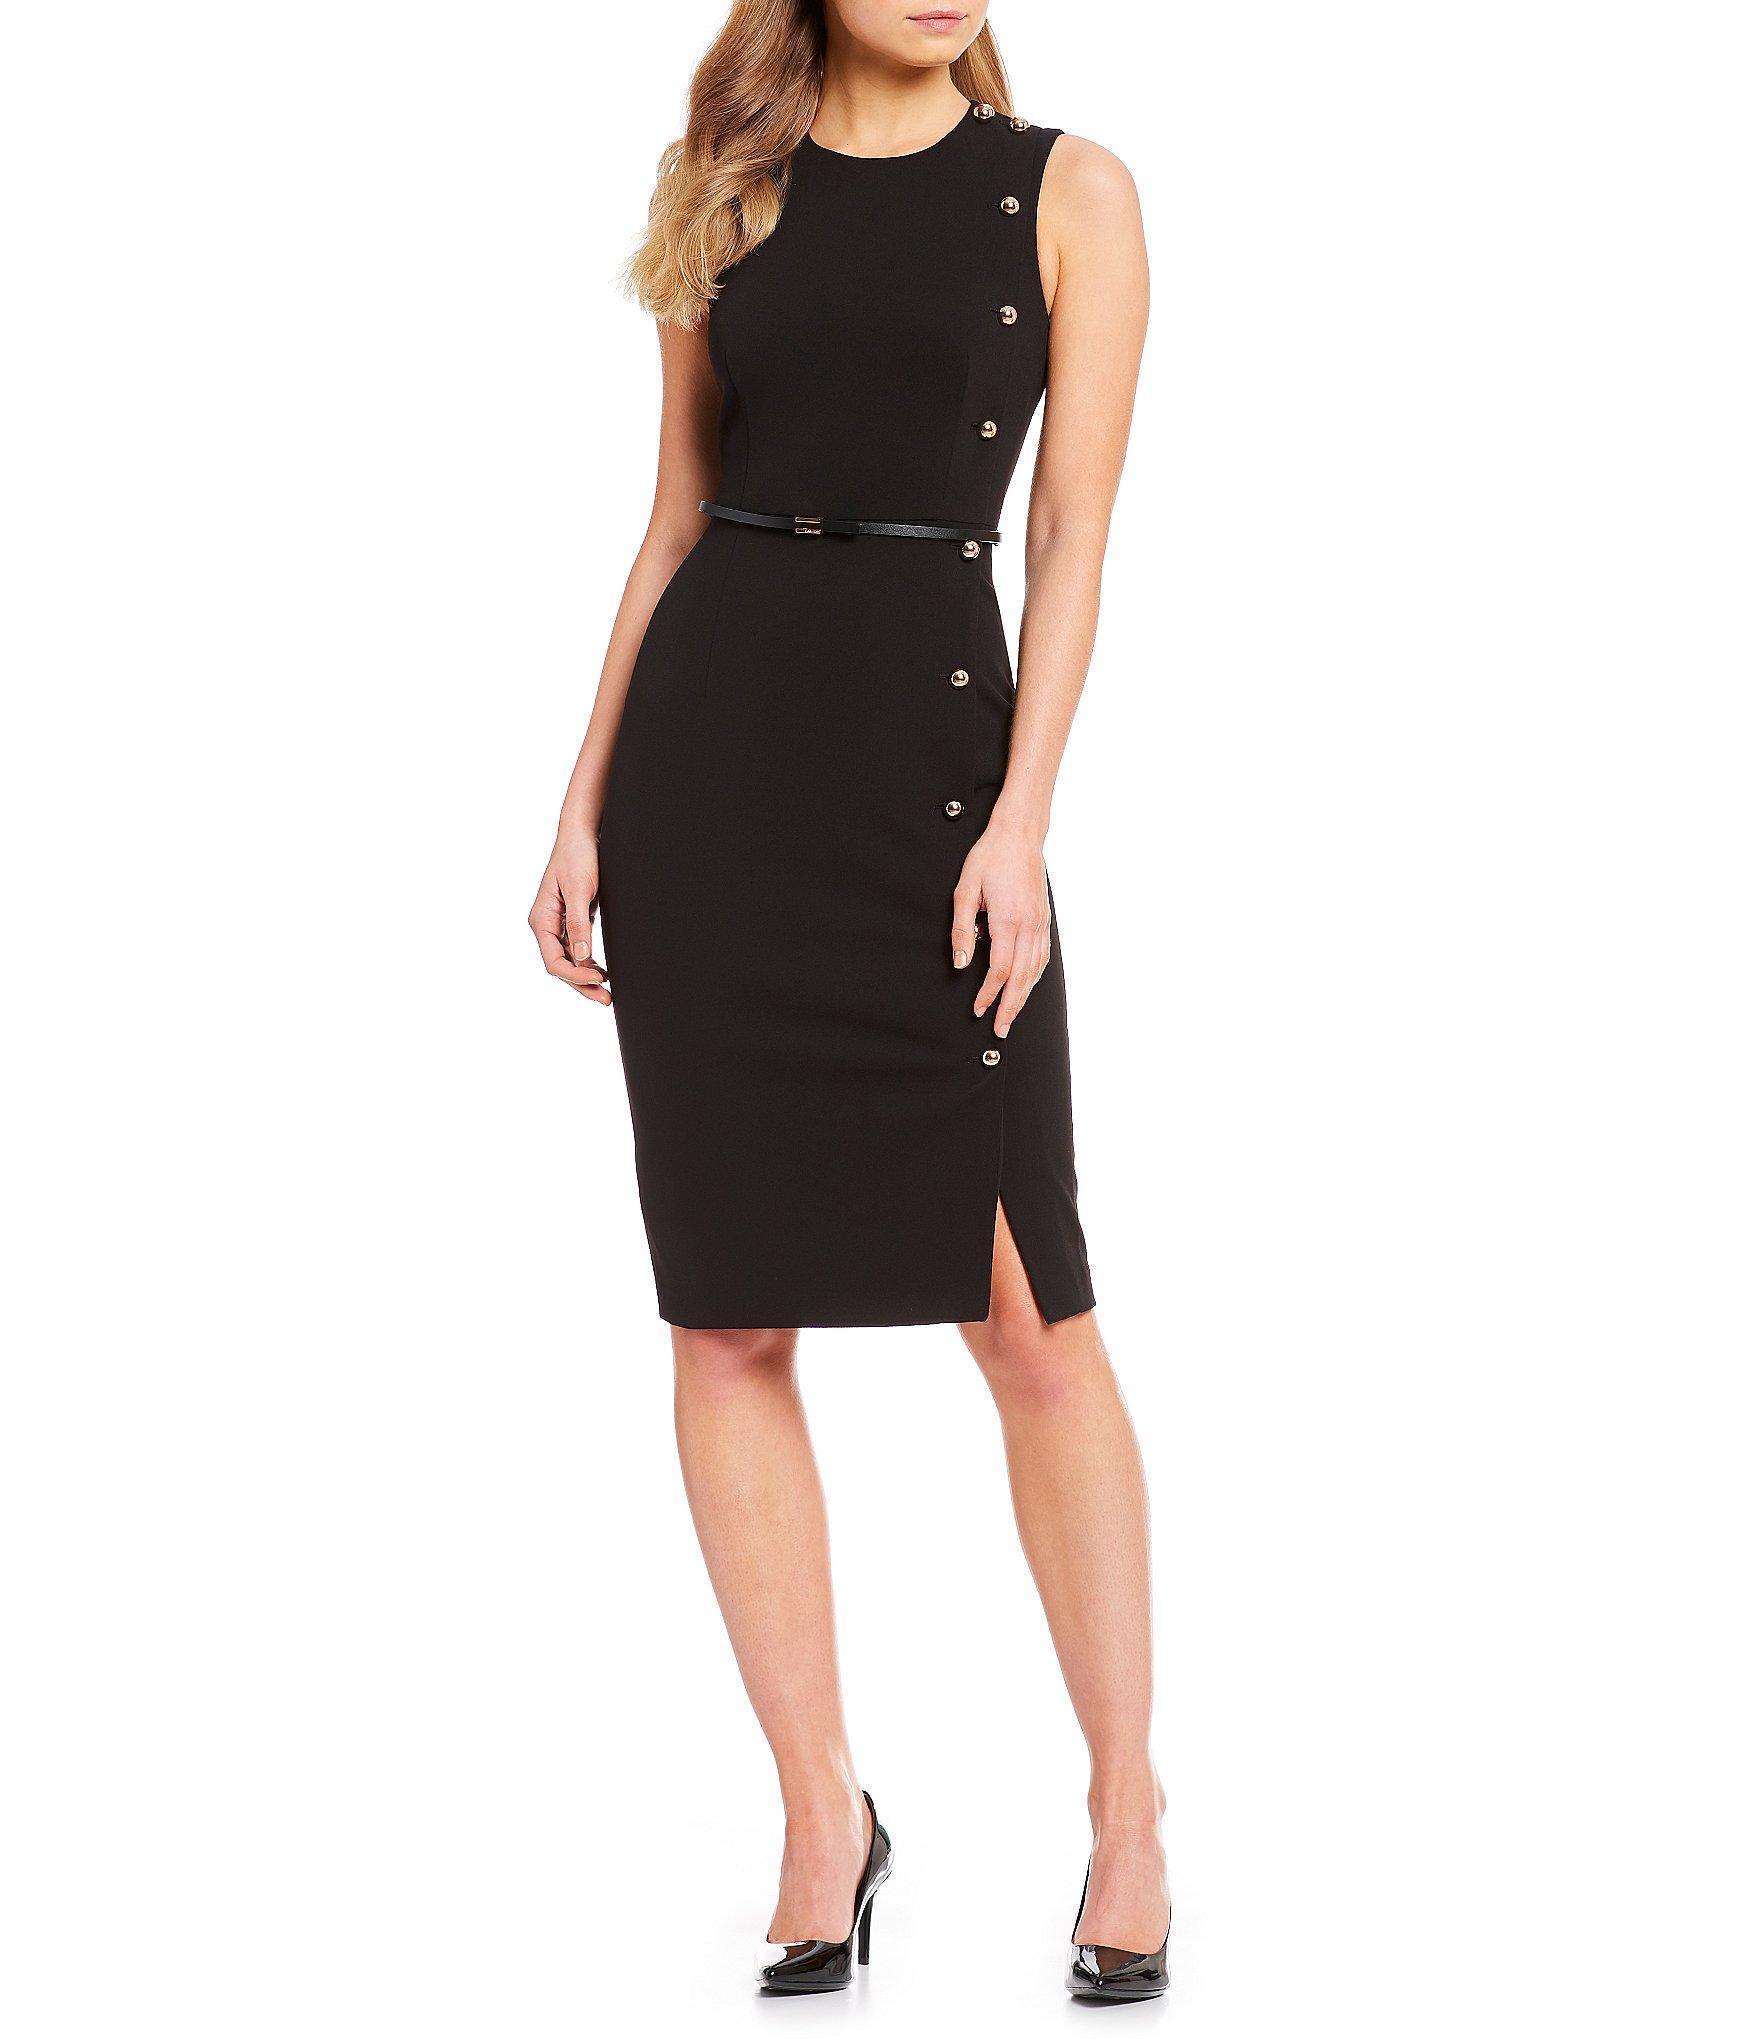 a2680325036 Calvin Klein Sleeveless Side Button Belted Sheath Dress in Black - Lyst